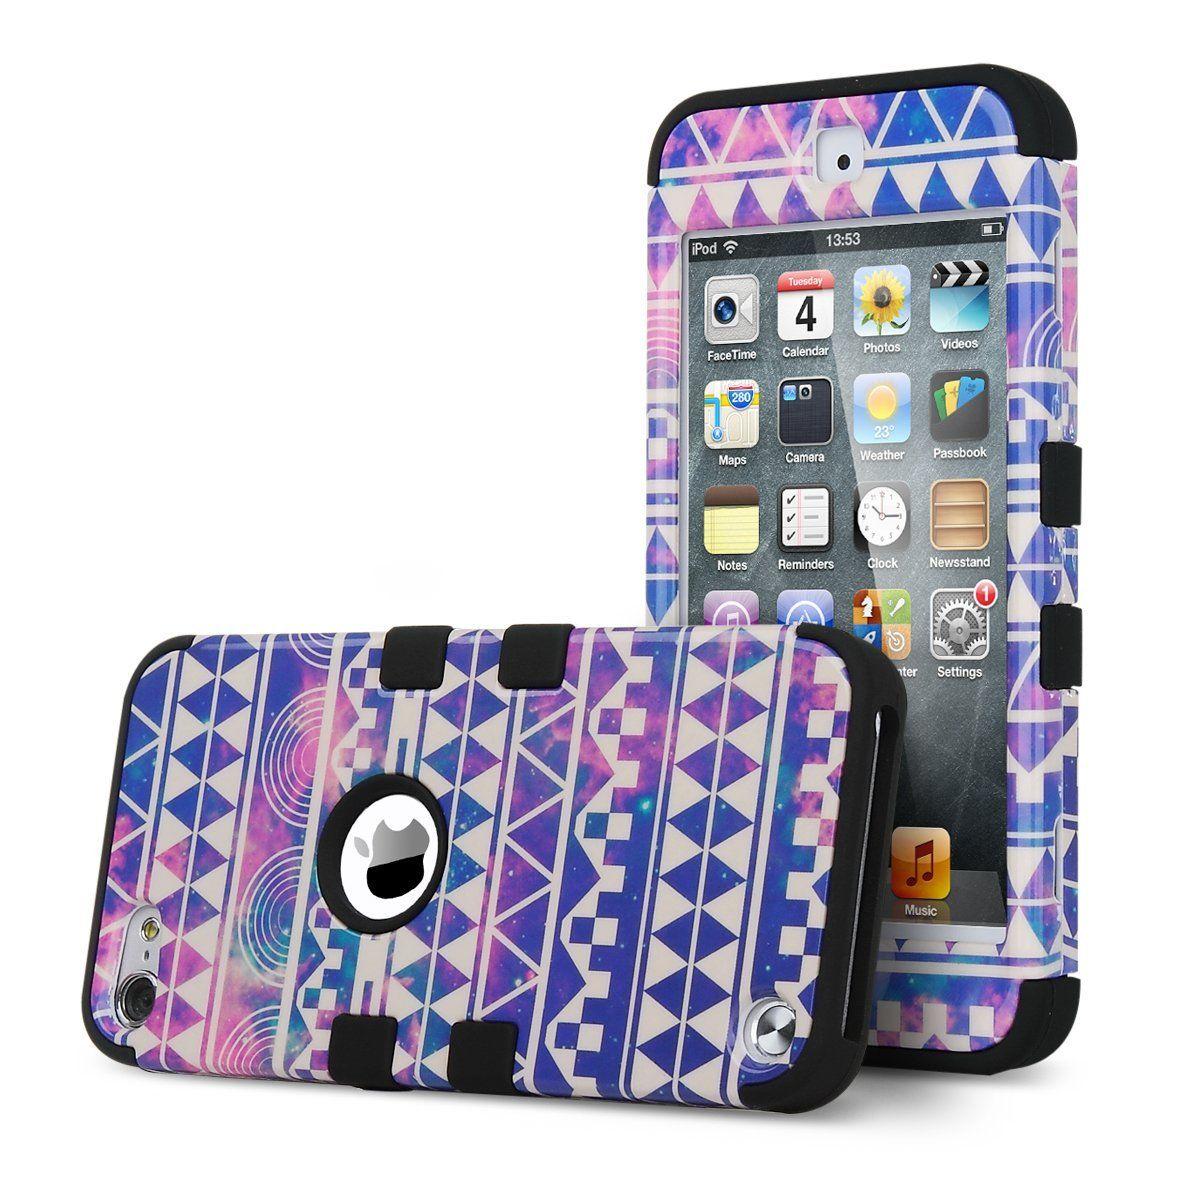 huge selection of ab5e2 8ce21 Amazon.com: ULAK iPod Touch 5 Case,iPod Touch 6 Case,Hybrid Hard ...